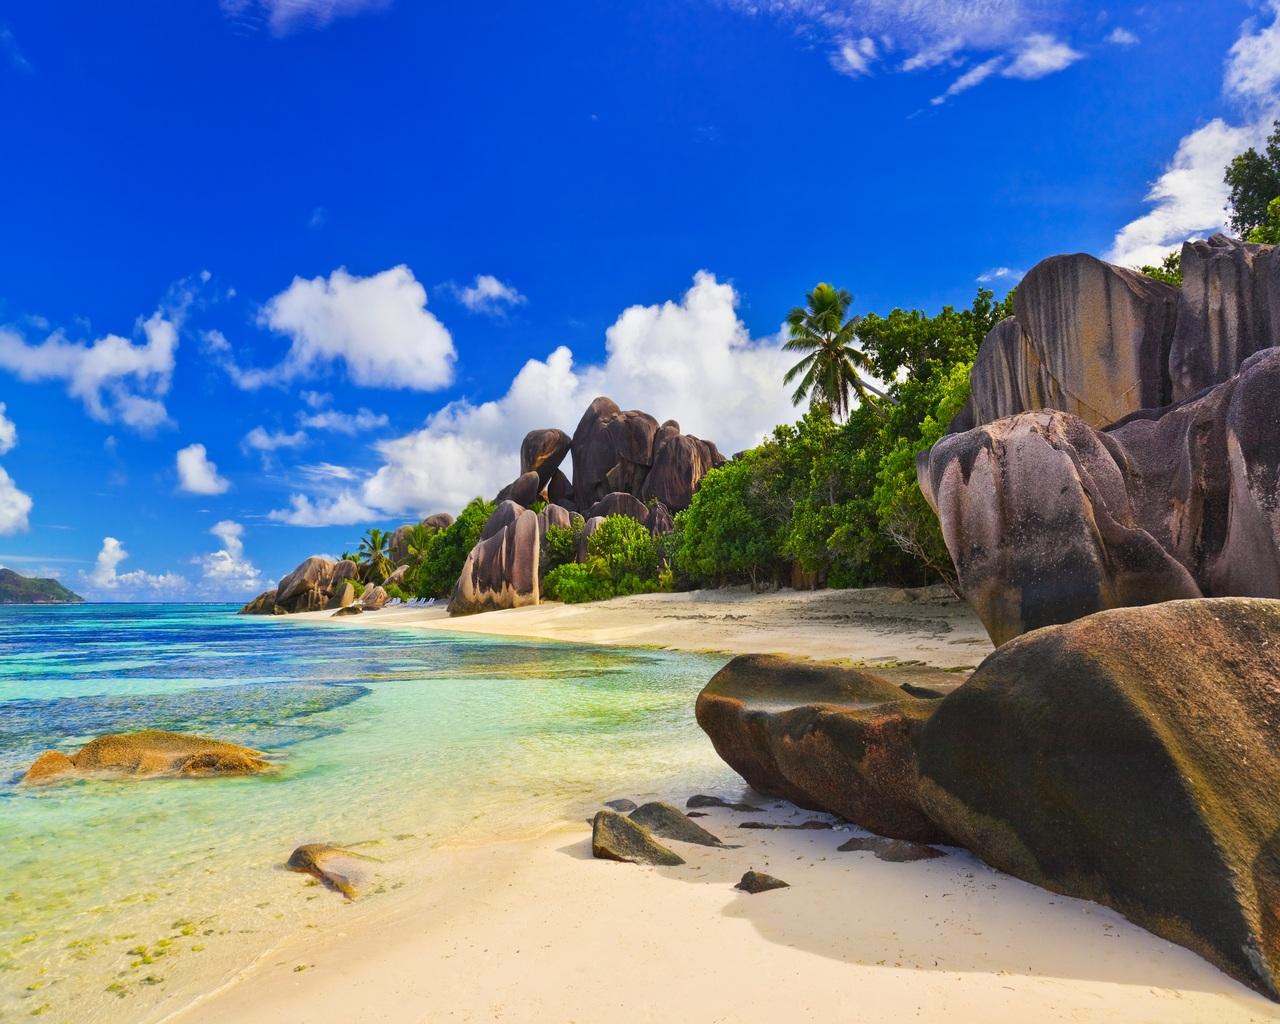 Island Paradise Wallpaper 56519